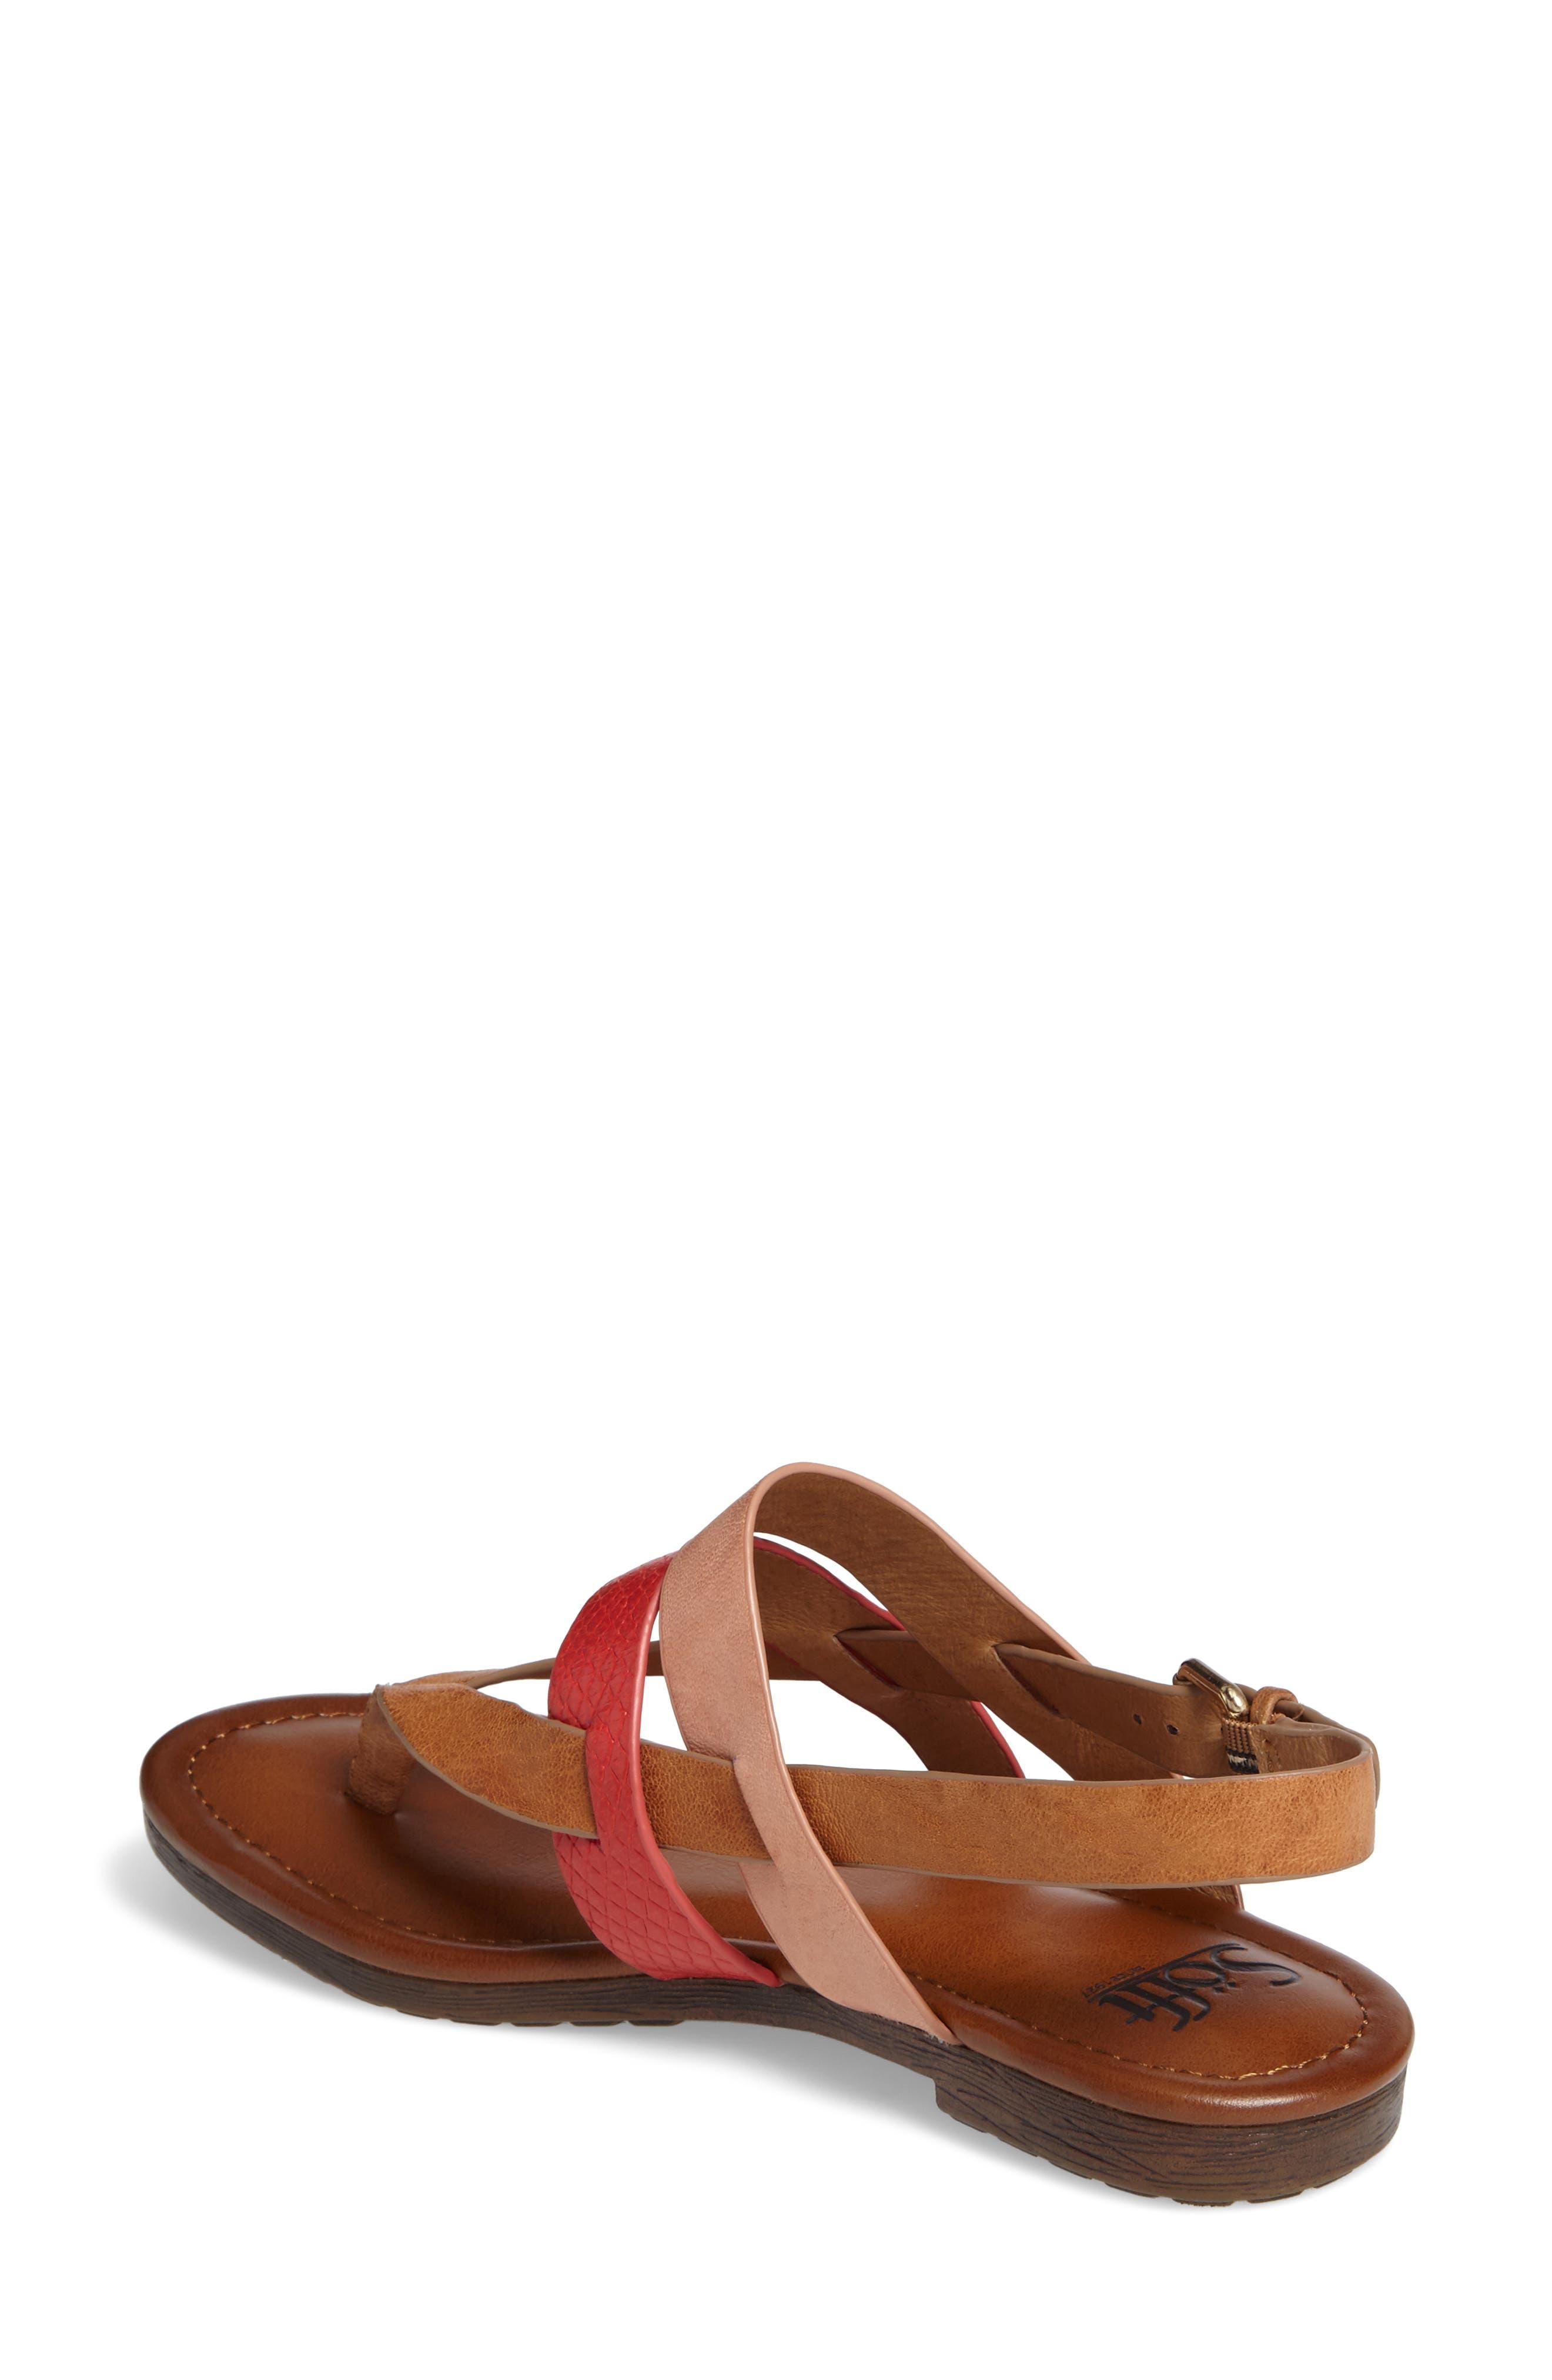 Alternate Image 2  - Söfft Bena Strappy Sandal (Women)